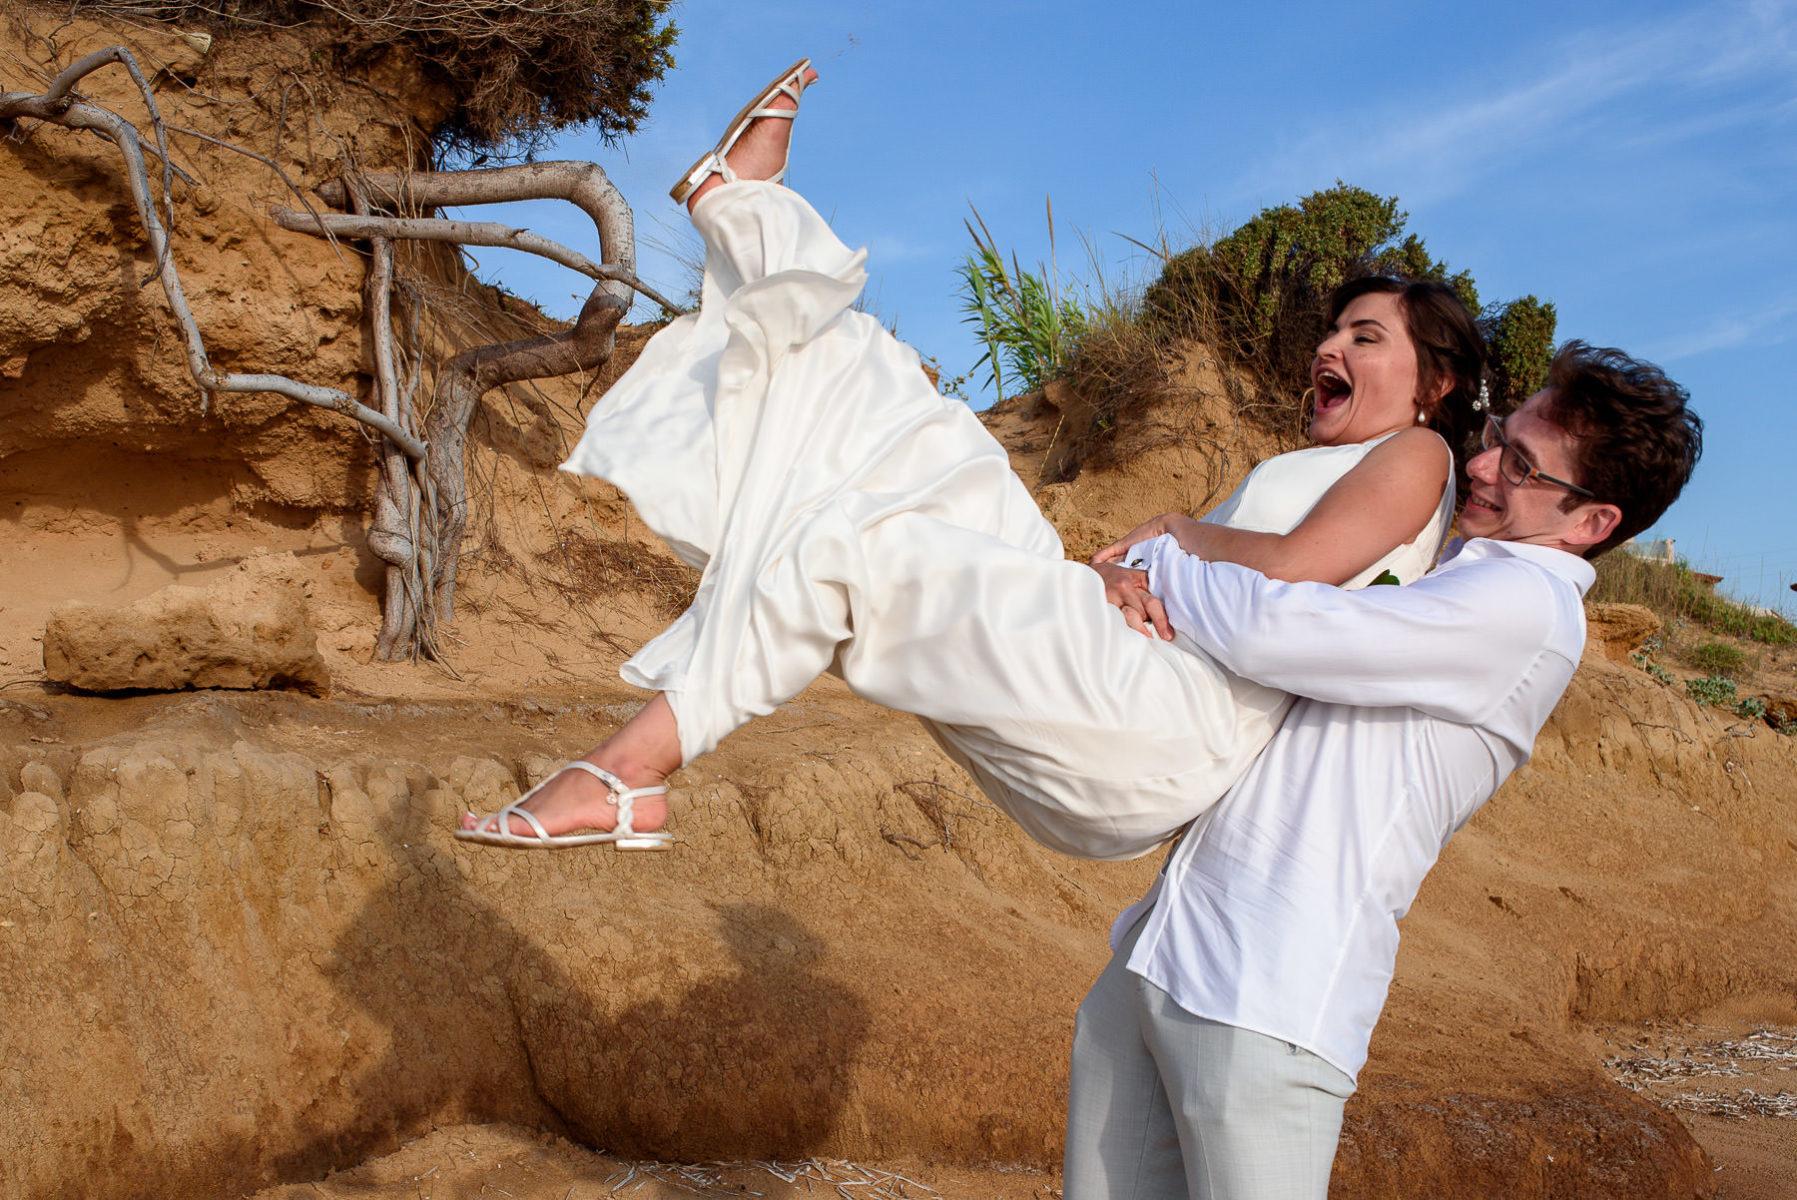 bride and groom having fun on a beach photo shoot